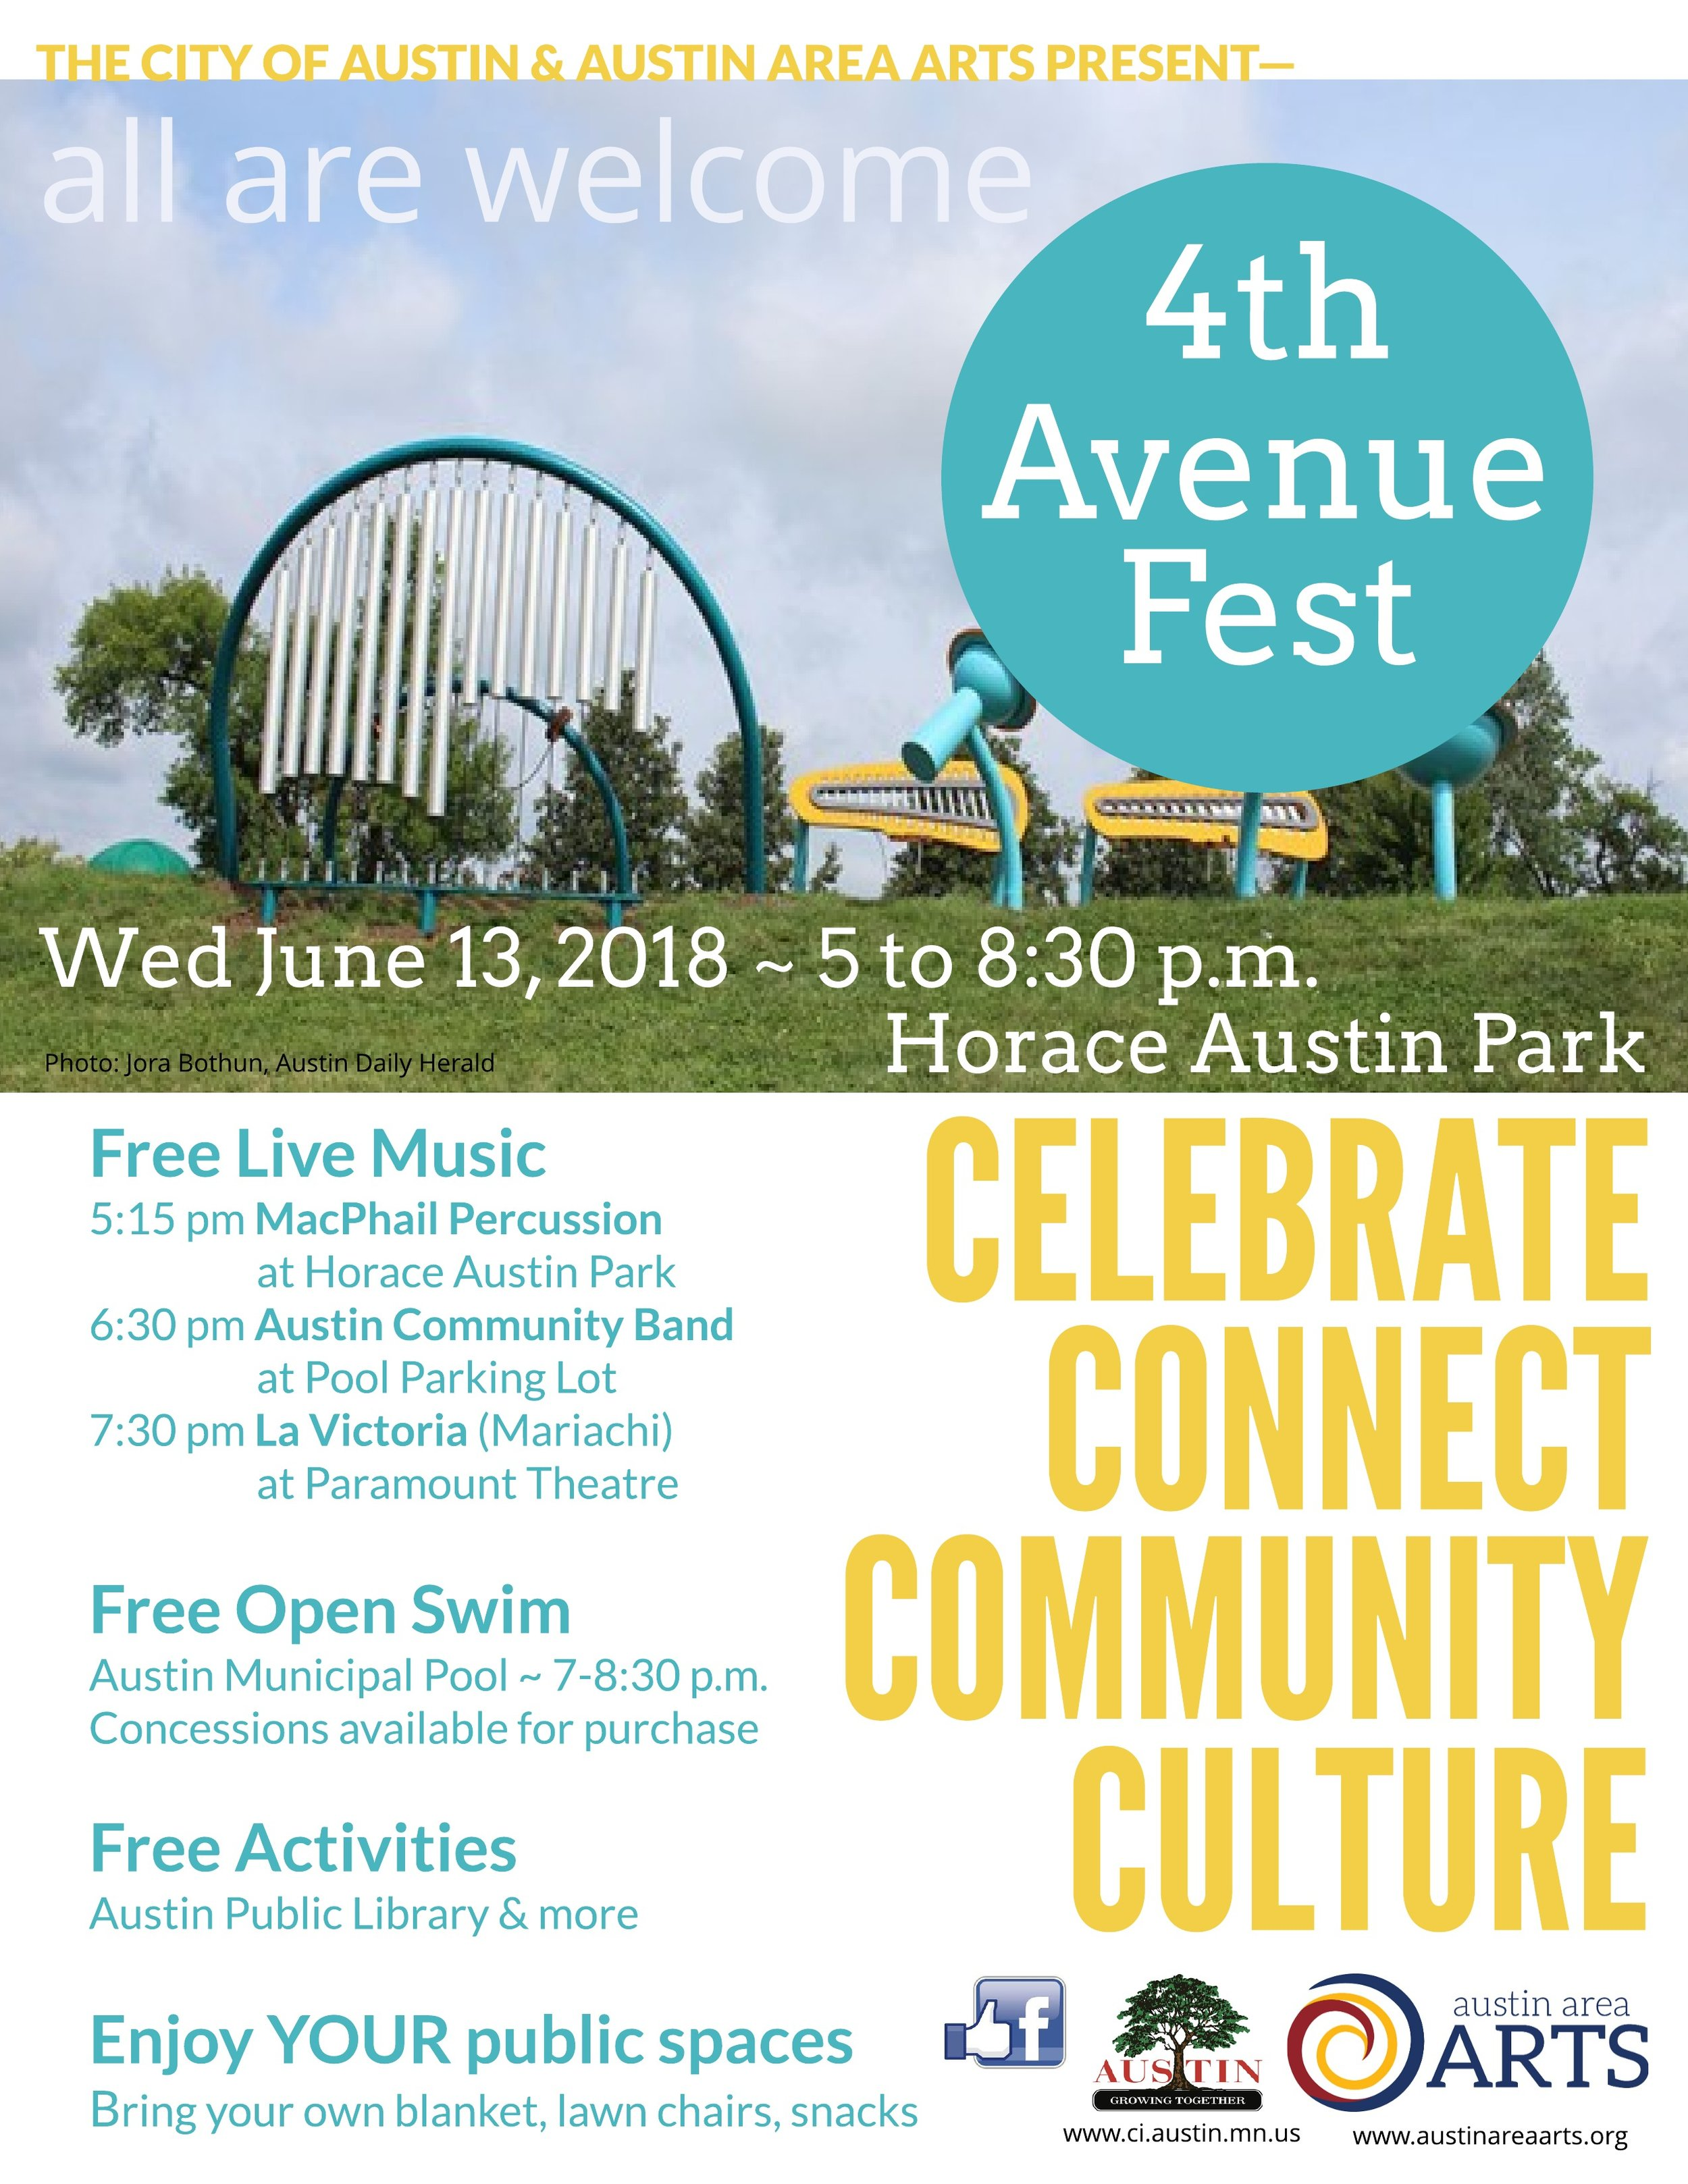 4th Ave Fest Flyer 2018.jpeg